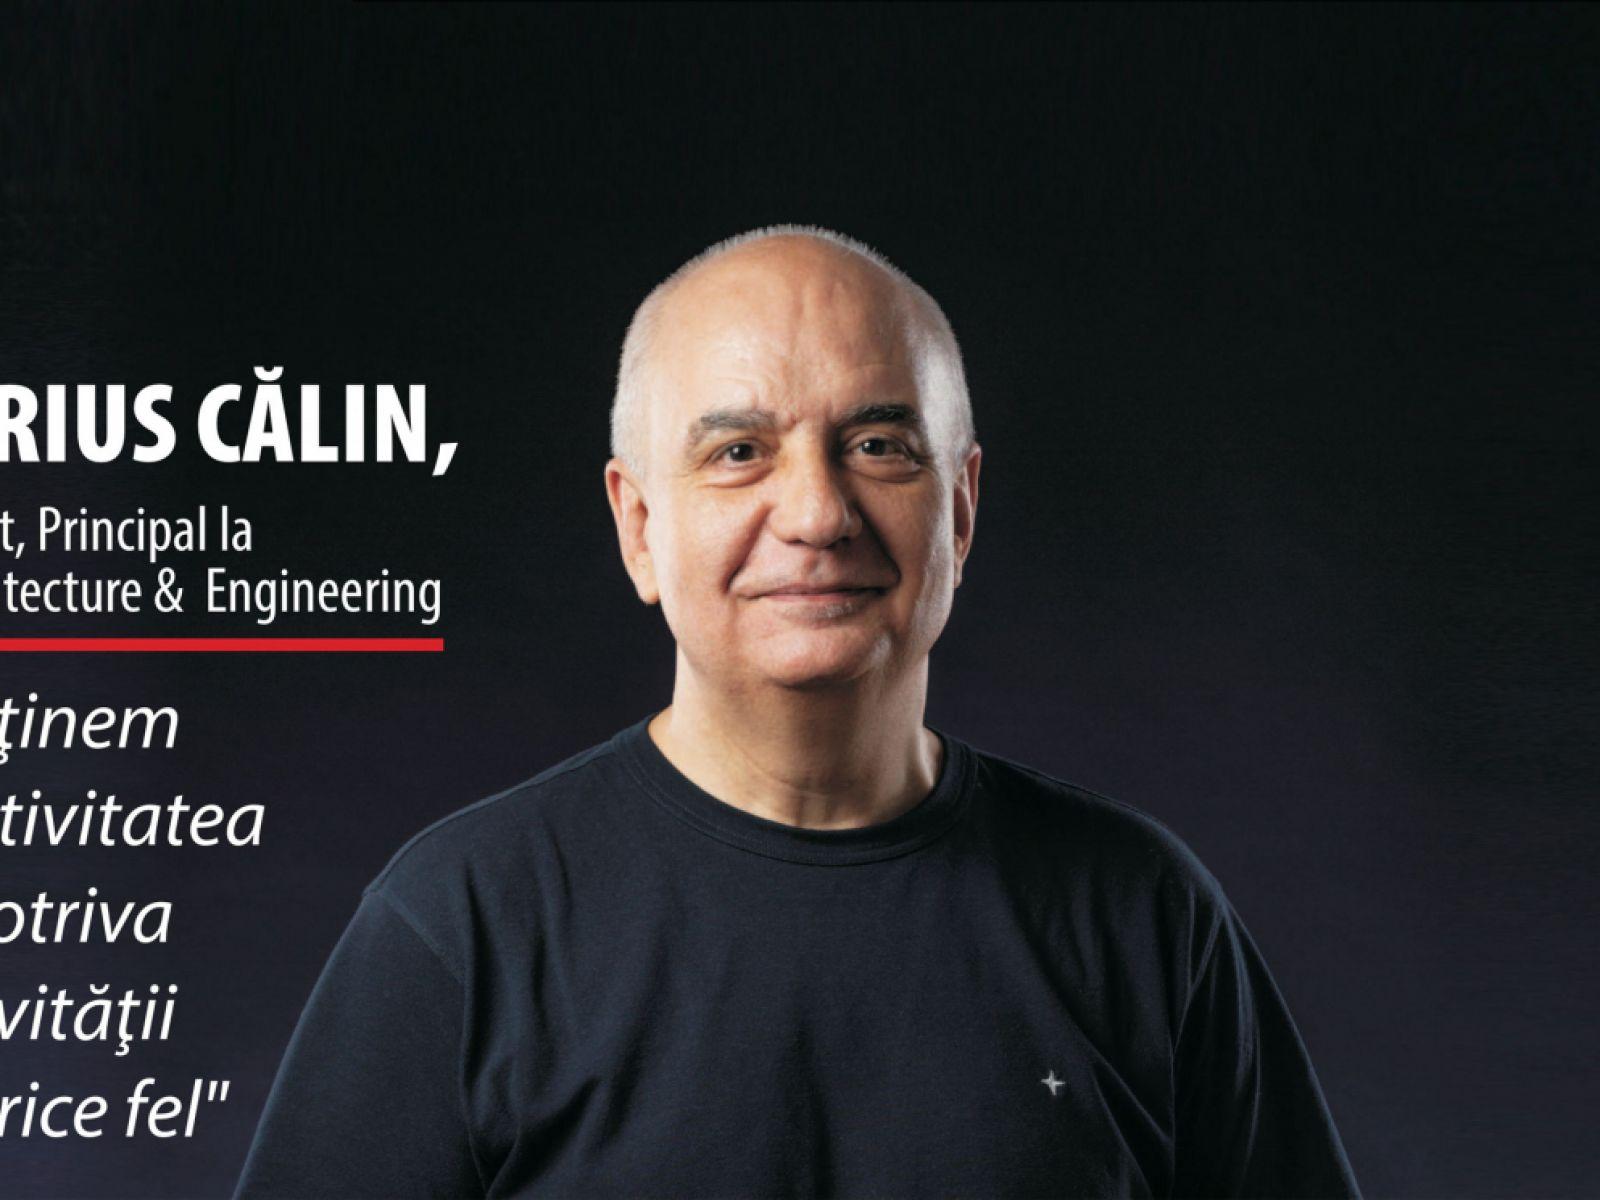 Marius Călin from X Architecture & Engineering on the cover of Bursa magazine